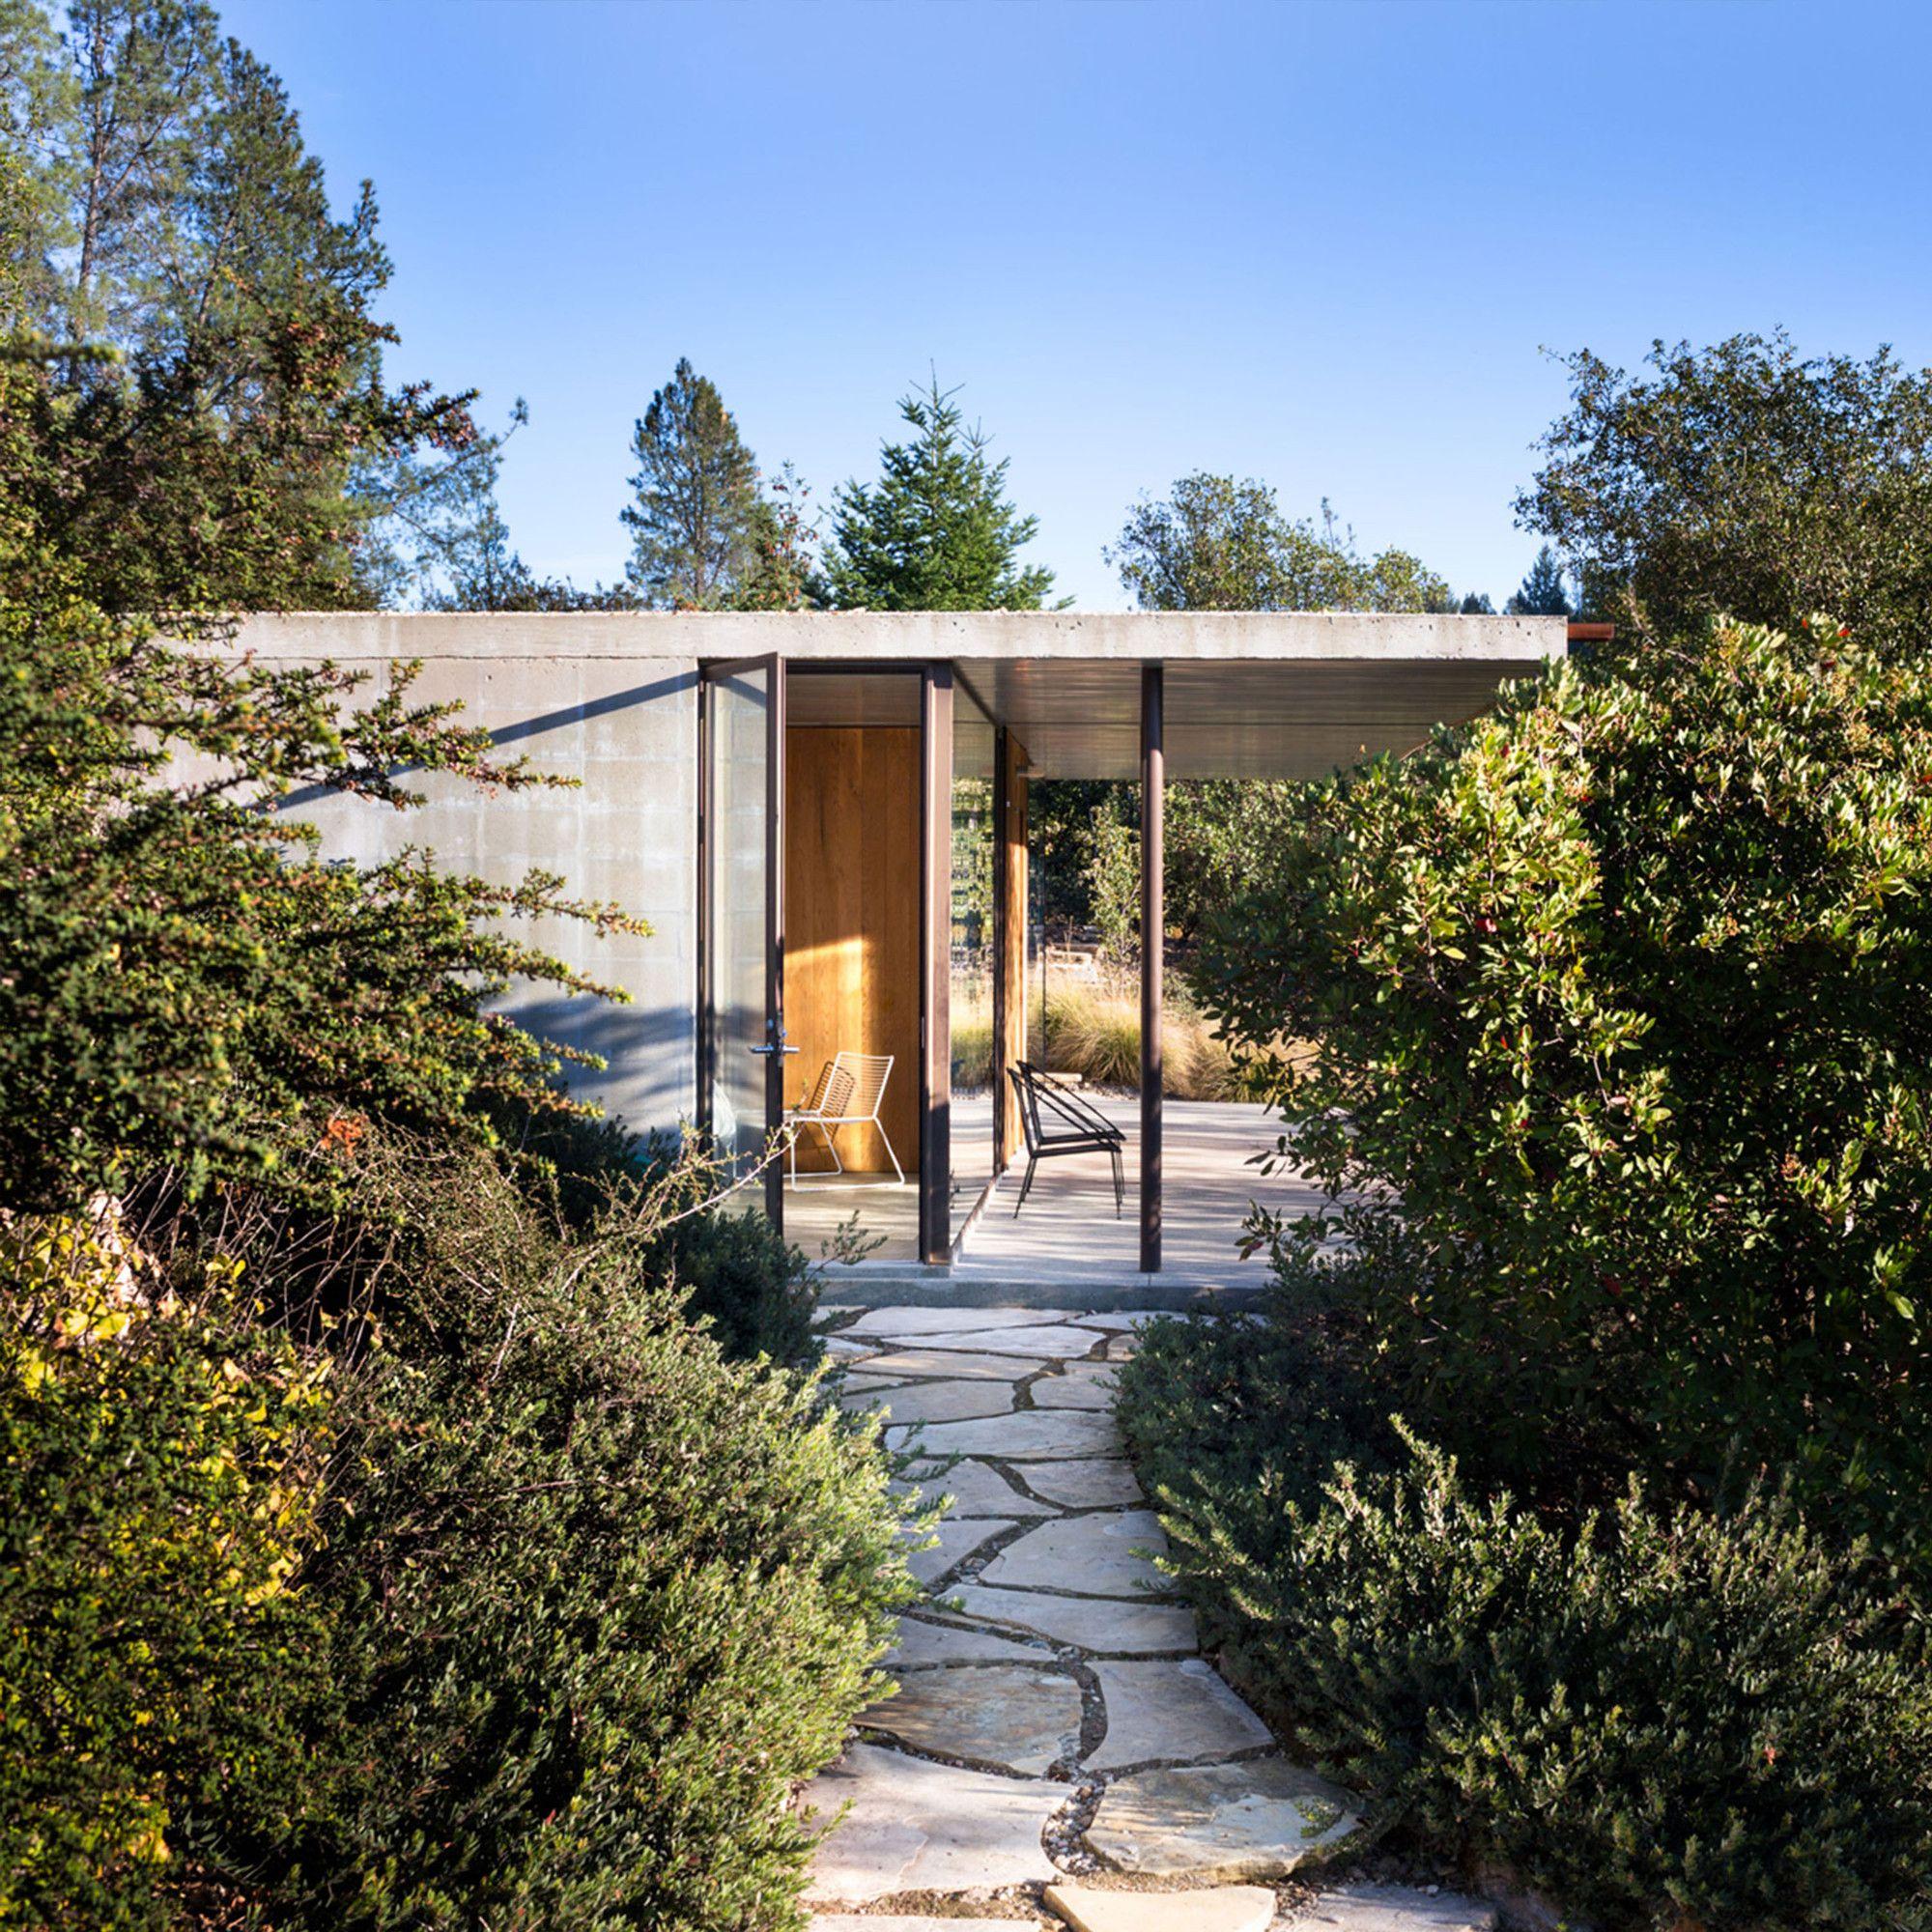 Atlanta S Premiere Landscape Architect: Napa Valley House / Steven Harris Architects